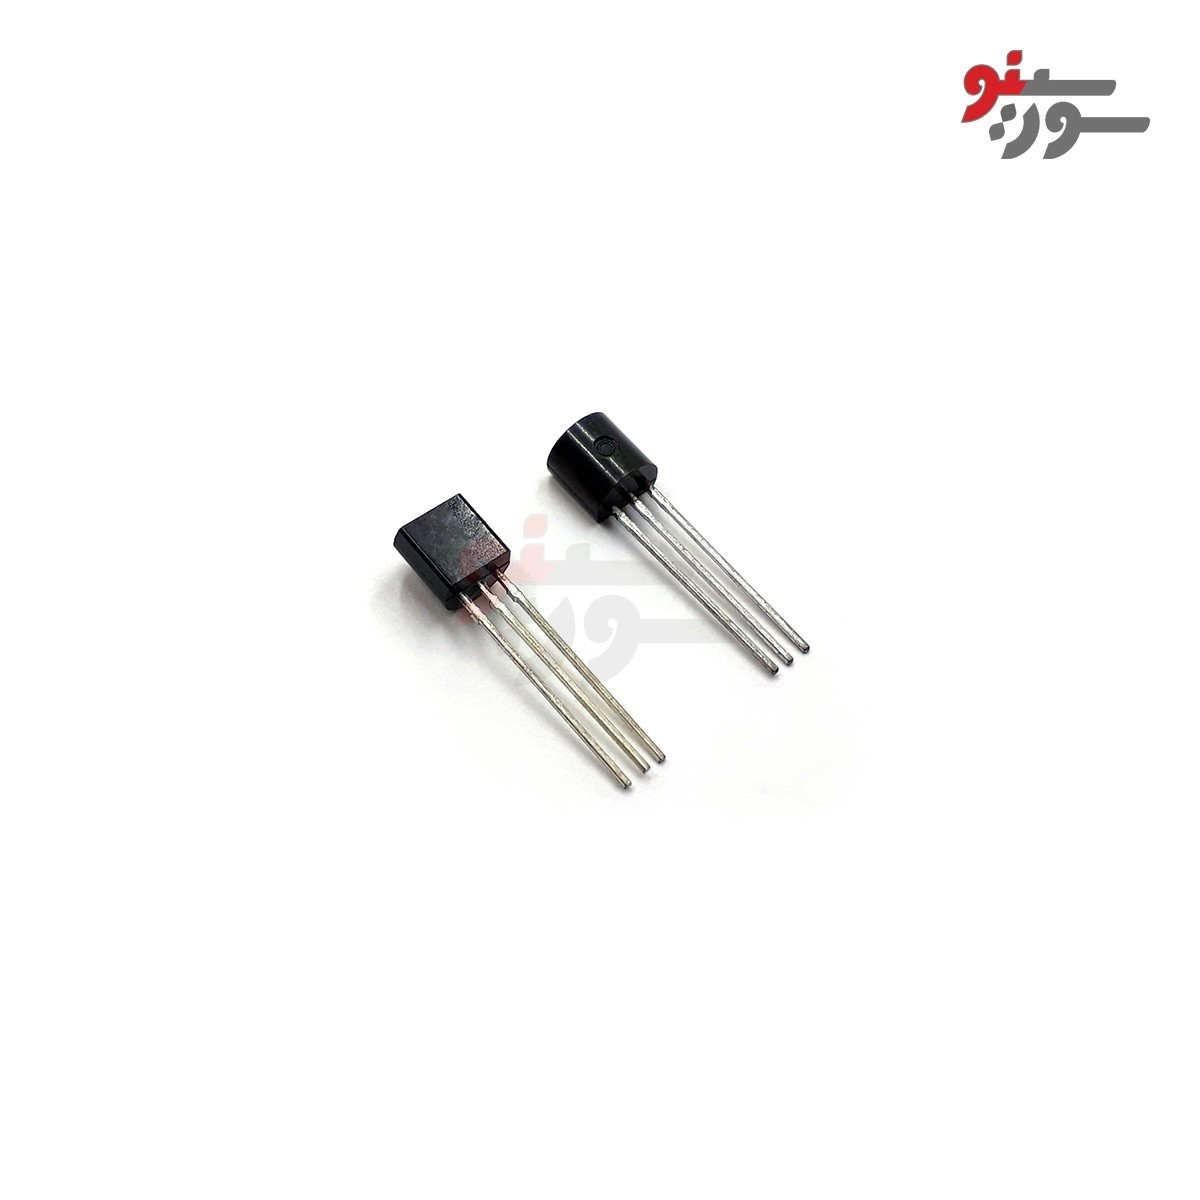 ترانزیستور 2N4403